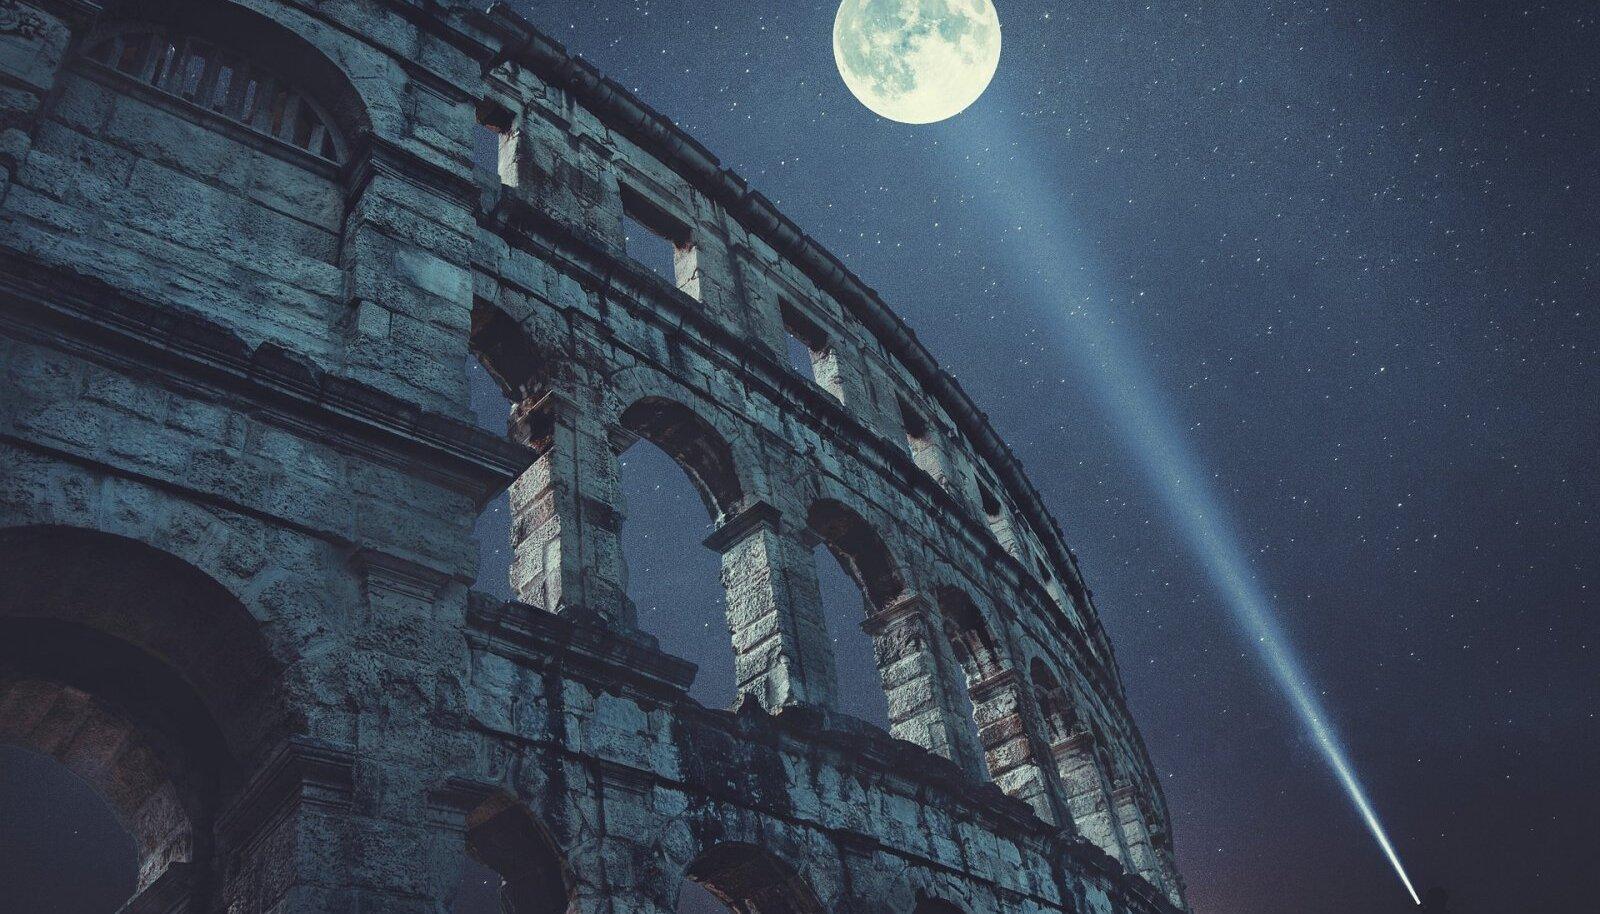 Colosseum kuuvalguses (Foto: Pixabay / enriquelopezgarre)